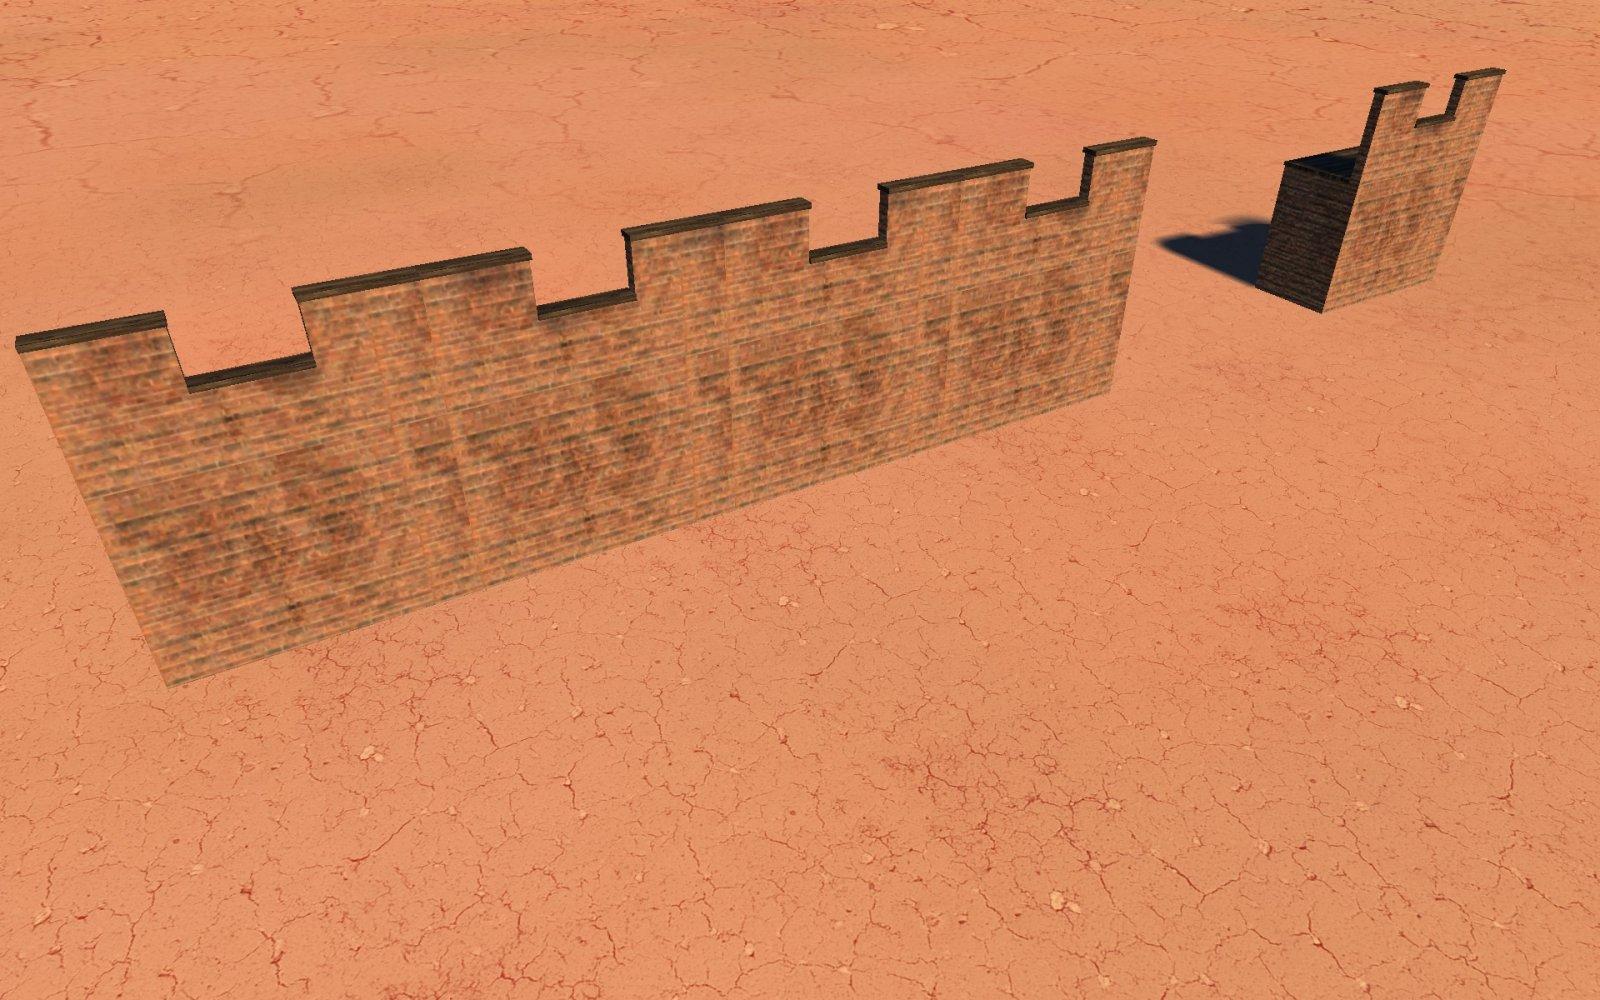 mdvp_brickwalls1_img02.jpg